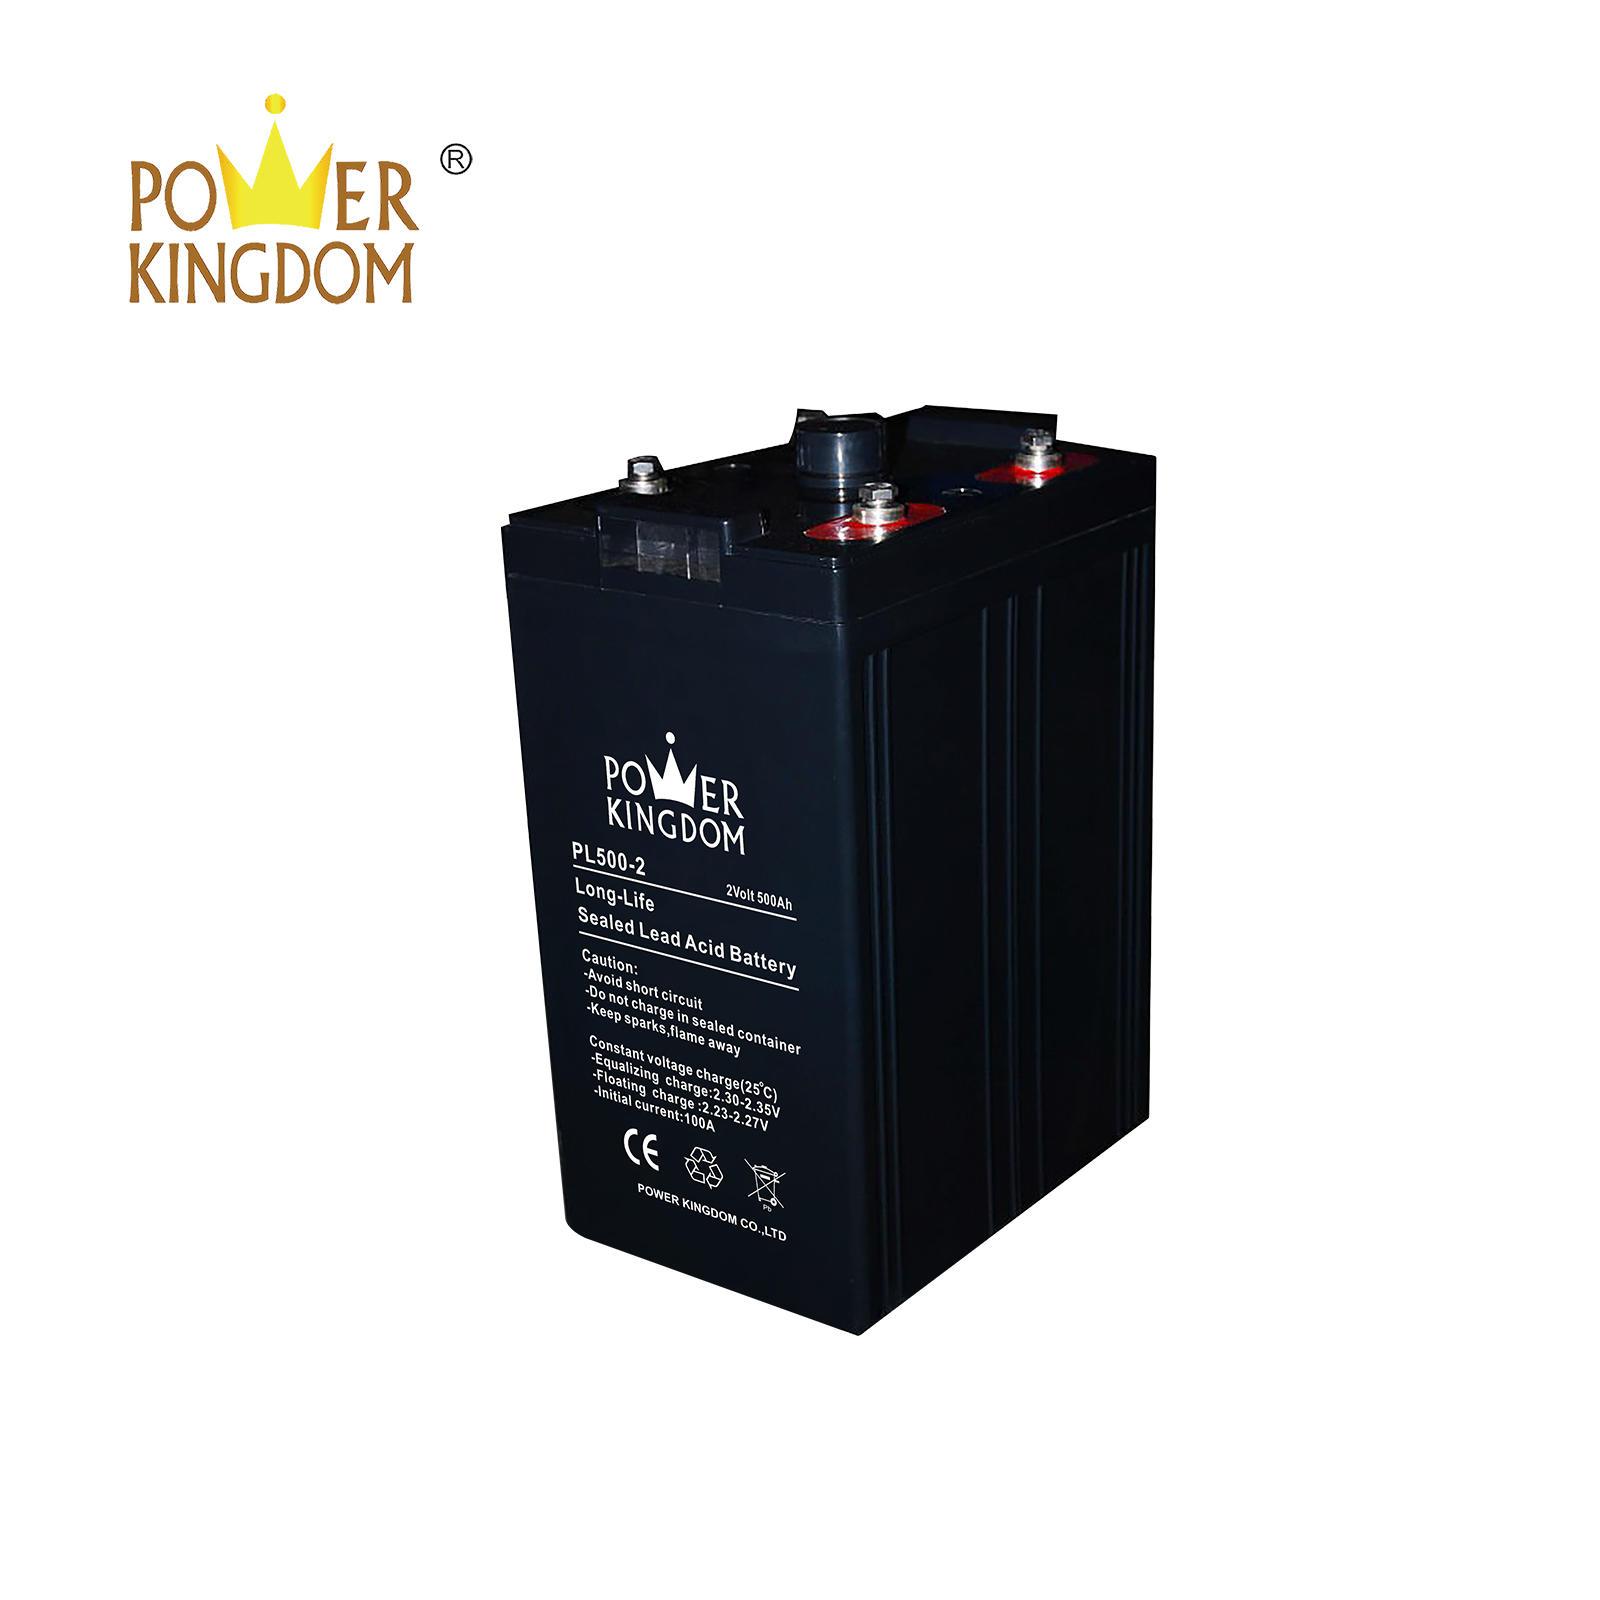 Power Kingdom 2v 500ah sealed lead acid battery with long life